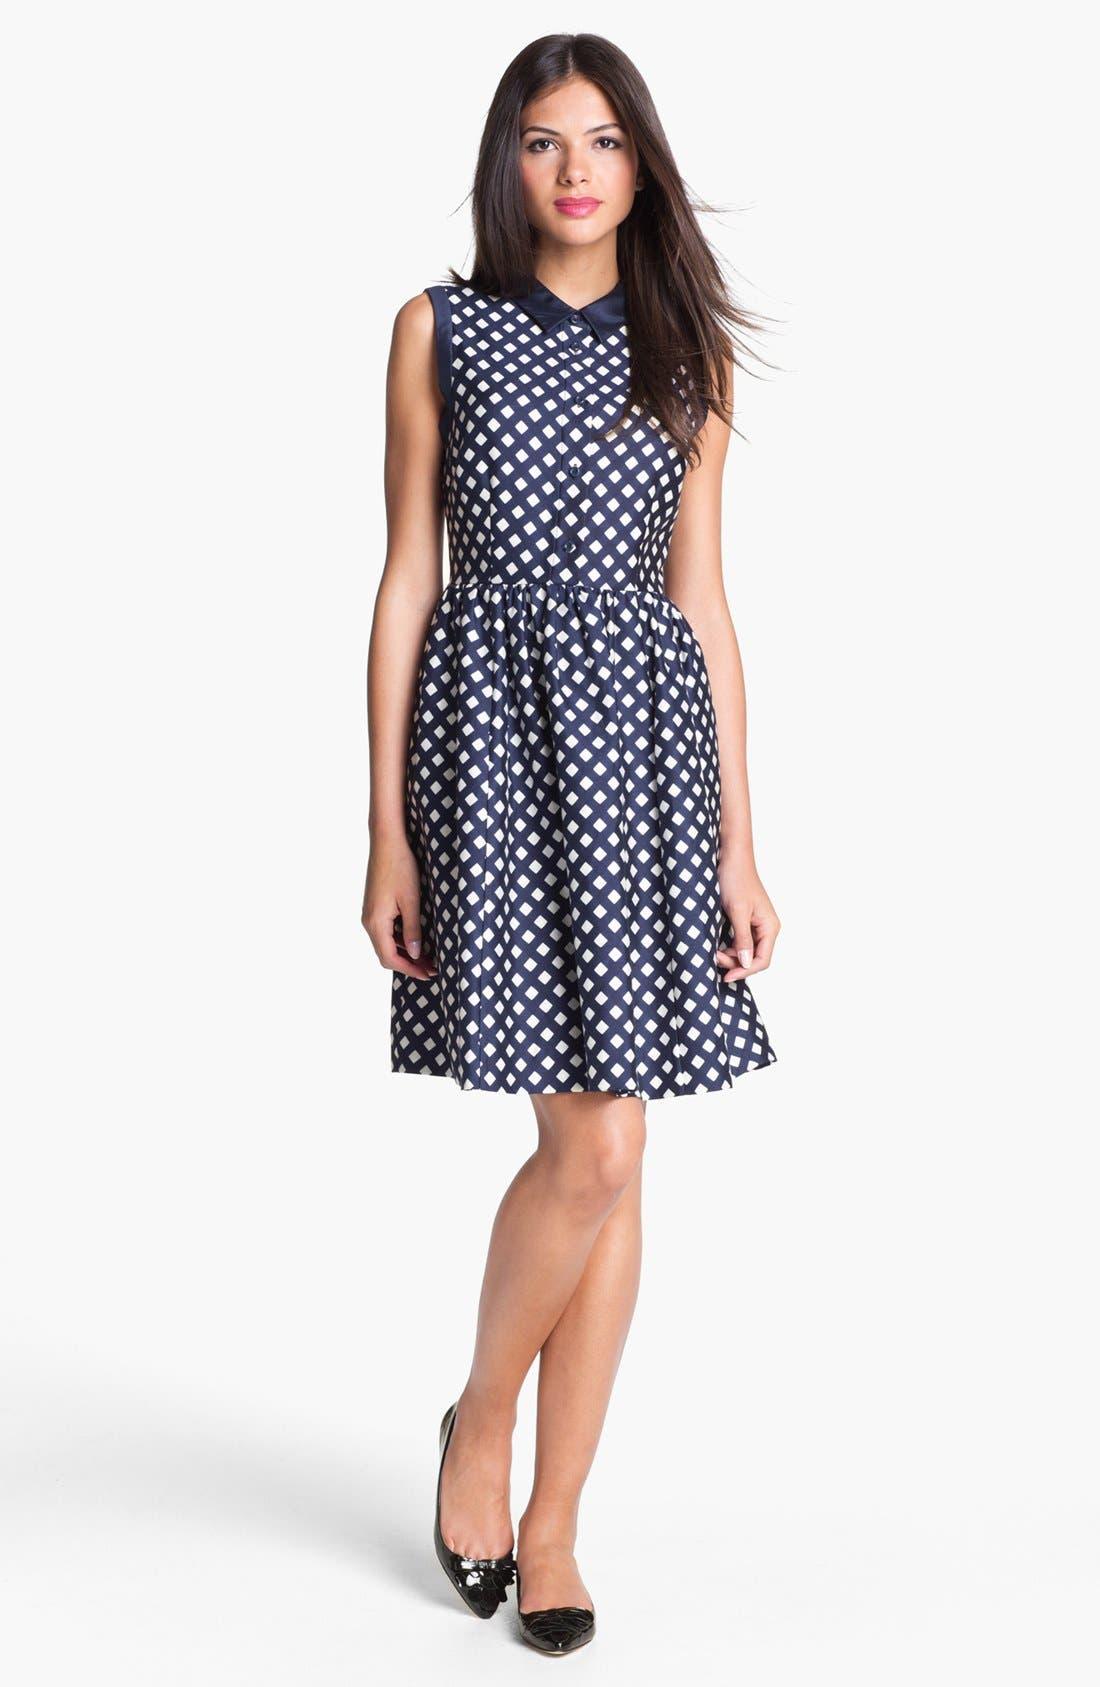 Alternate Image 1 Selected - kate spade new york 'addison' cotton blend fit & flare dress